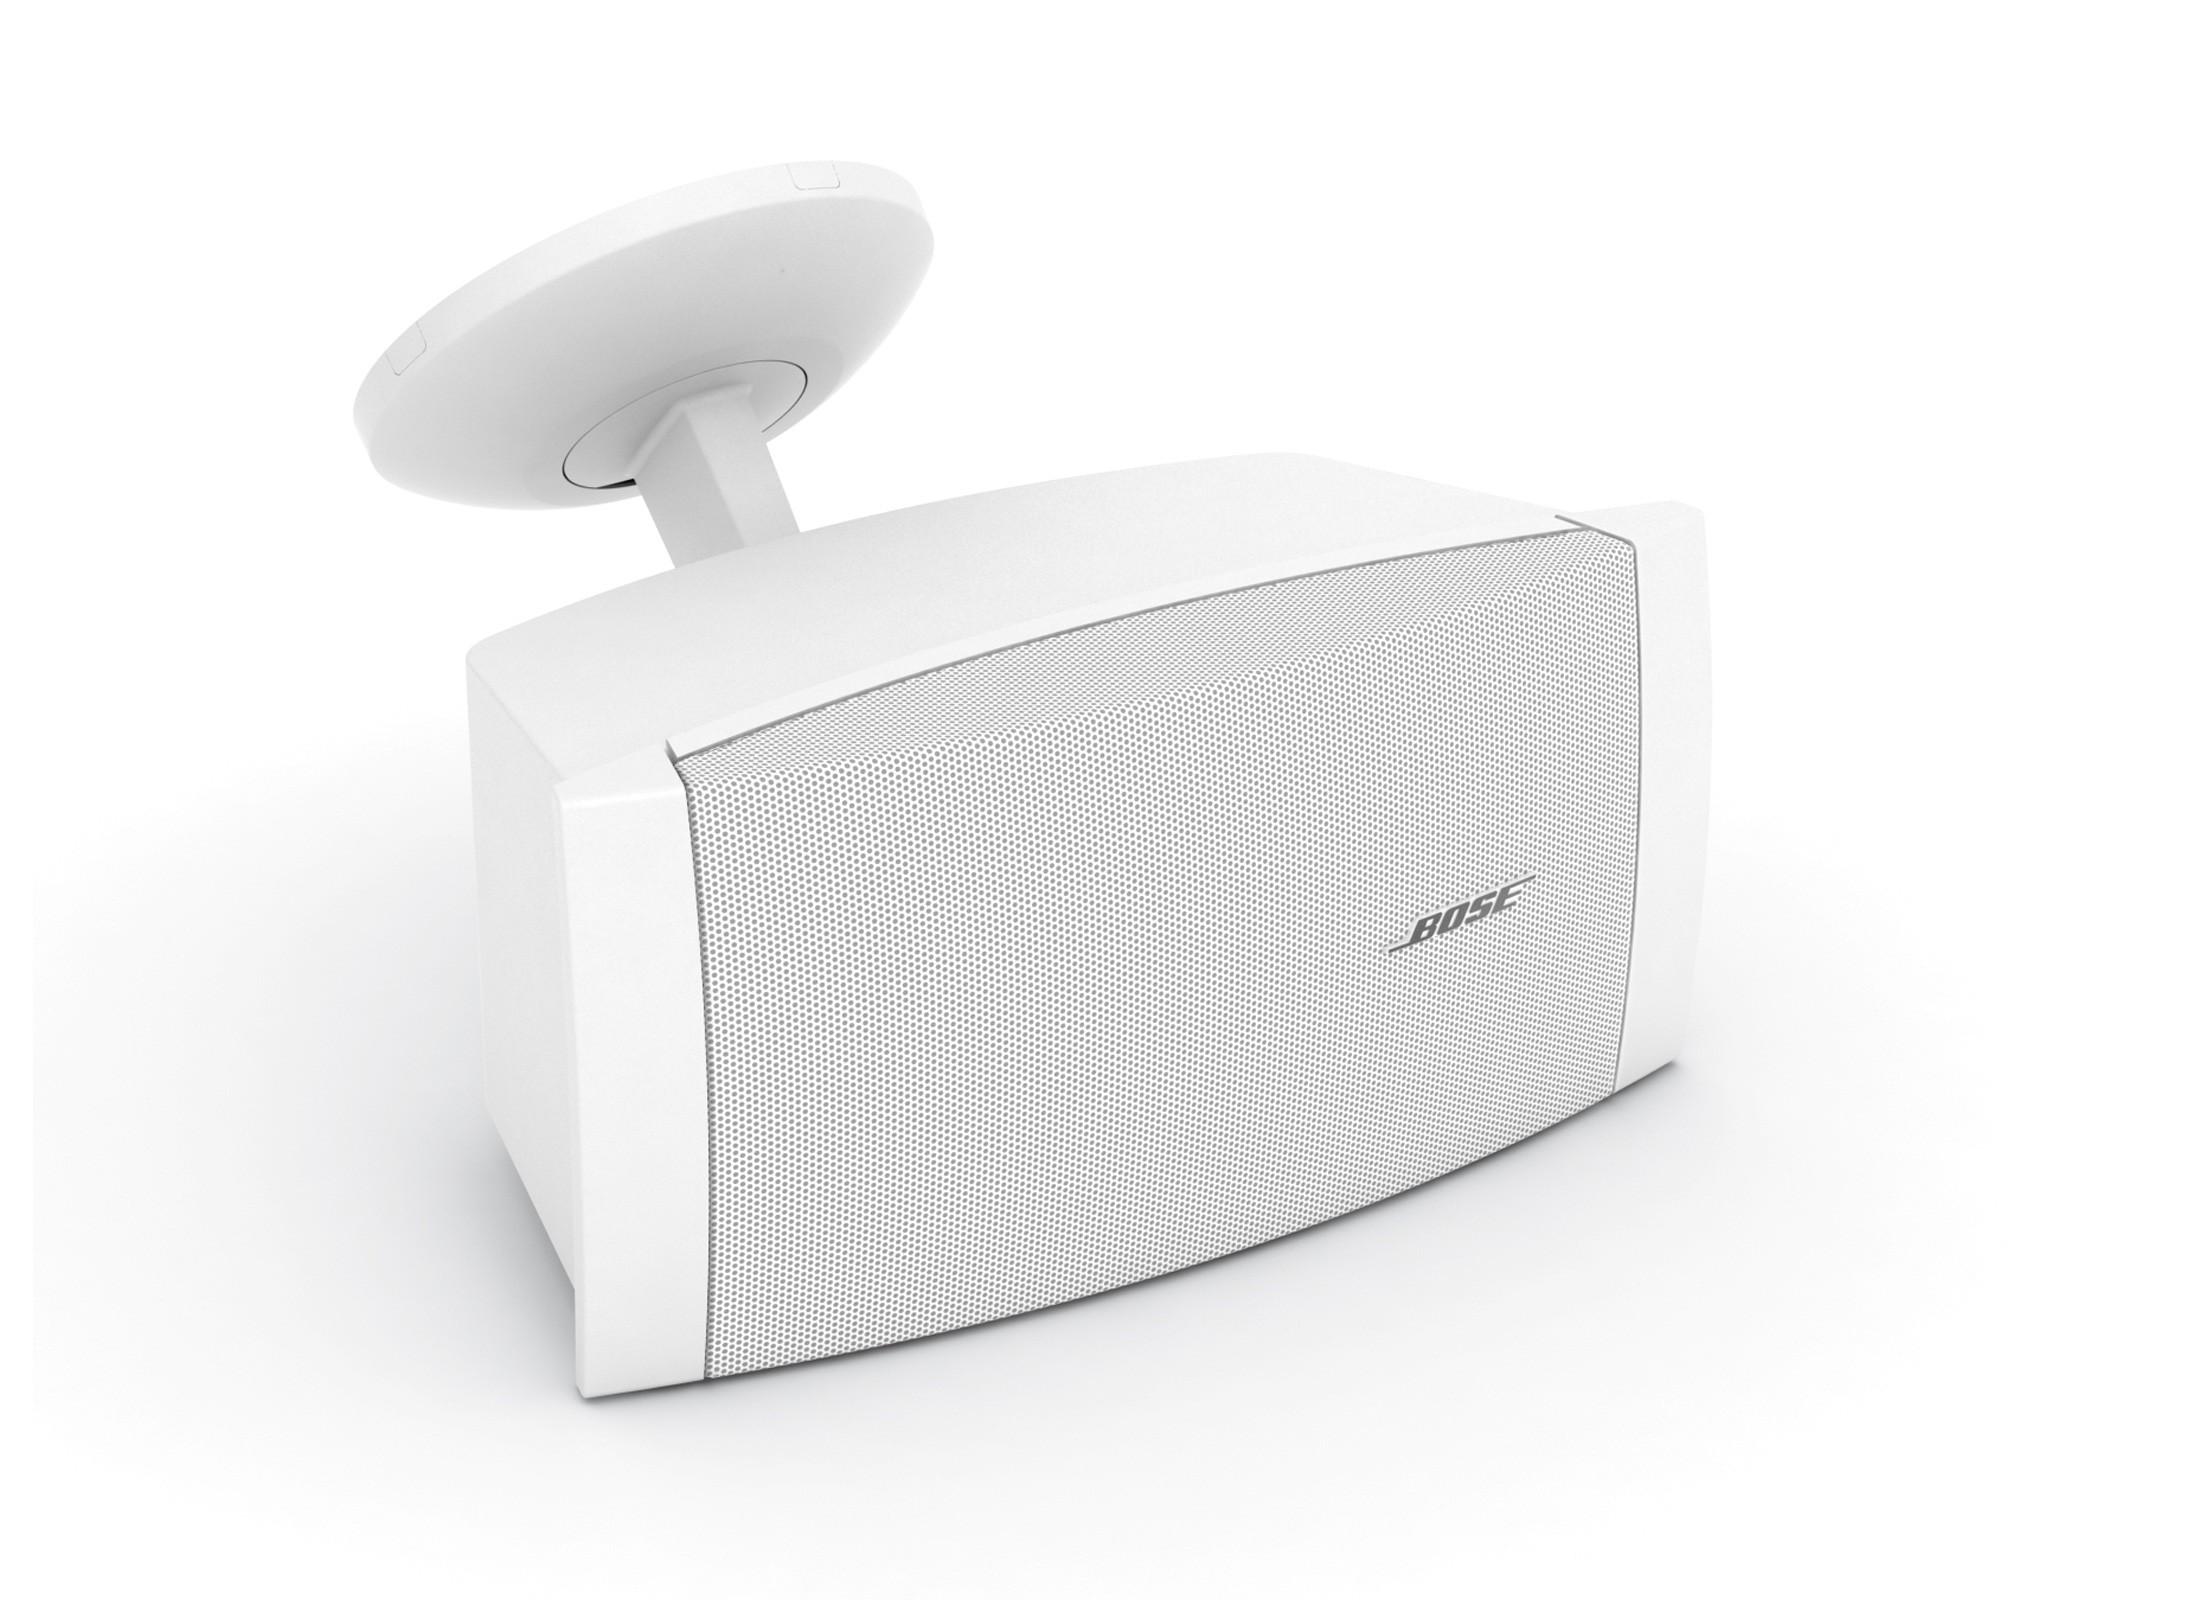 bose freespace ds 40se outdoor lautsprecher wei g nstig. Black Bedroom Furniture Sets. Home Design Ideas